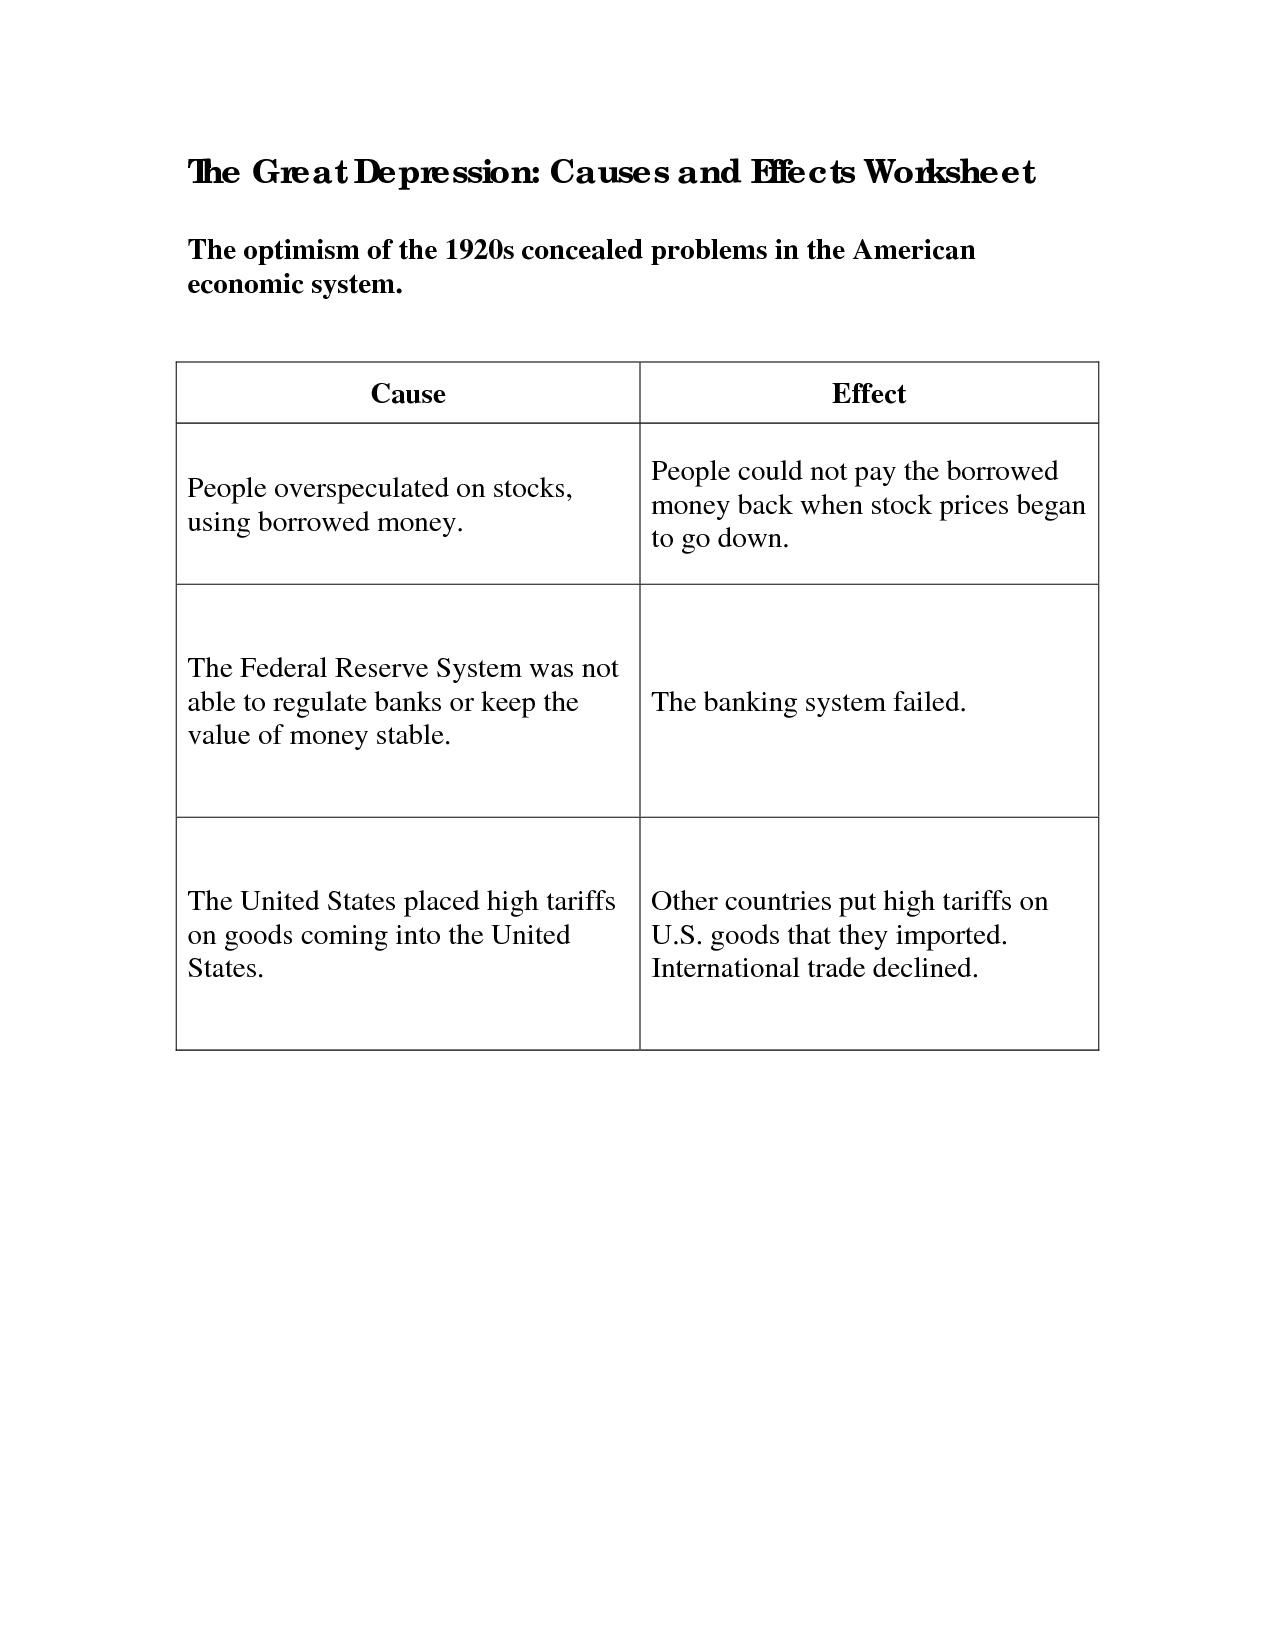 Great Depressionysis Worksheet